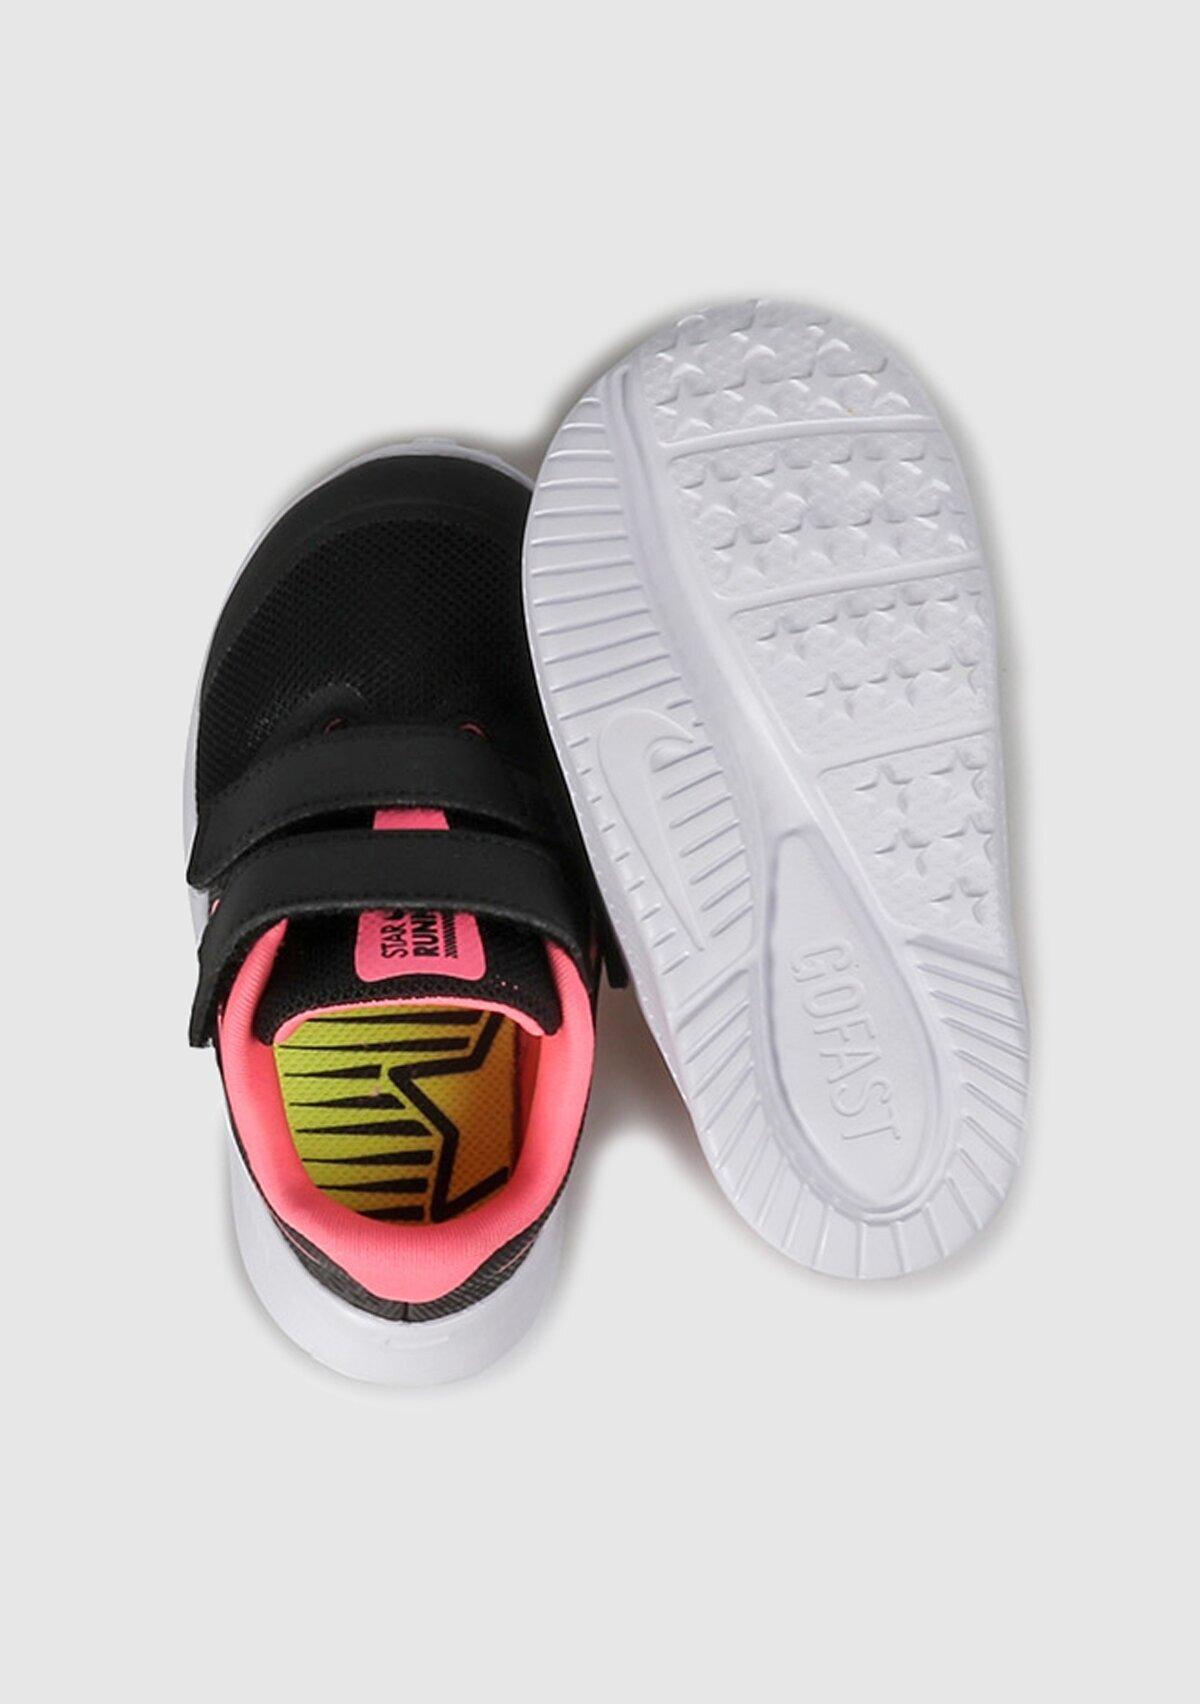 resm Star Runner 2 Siyah Kız Çocuk Koşu Ayakkabısı At1803-002